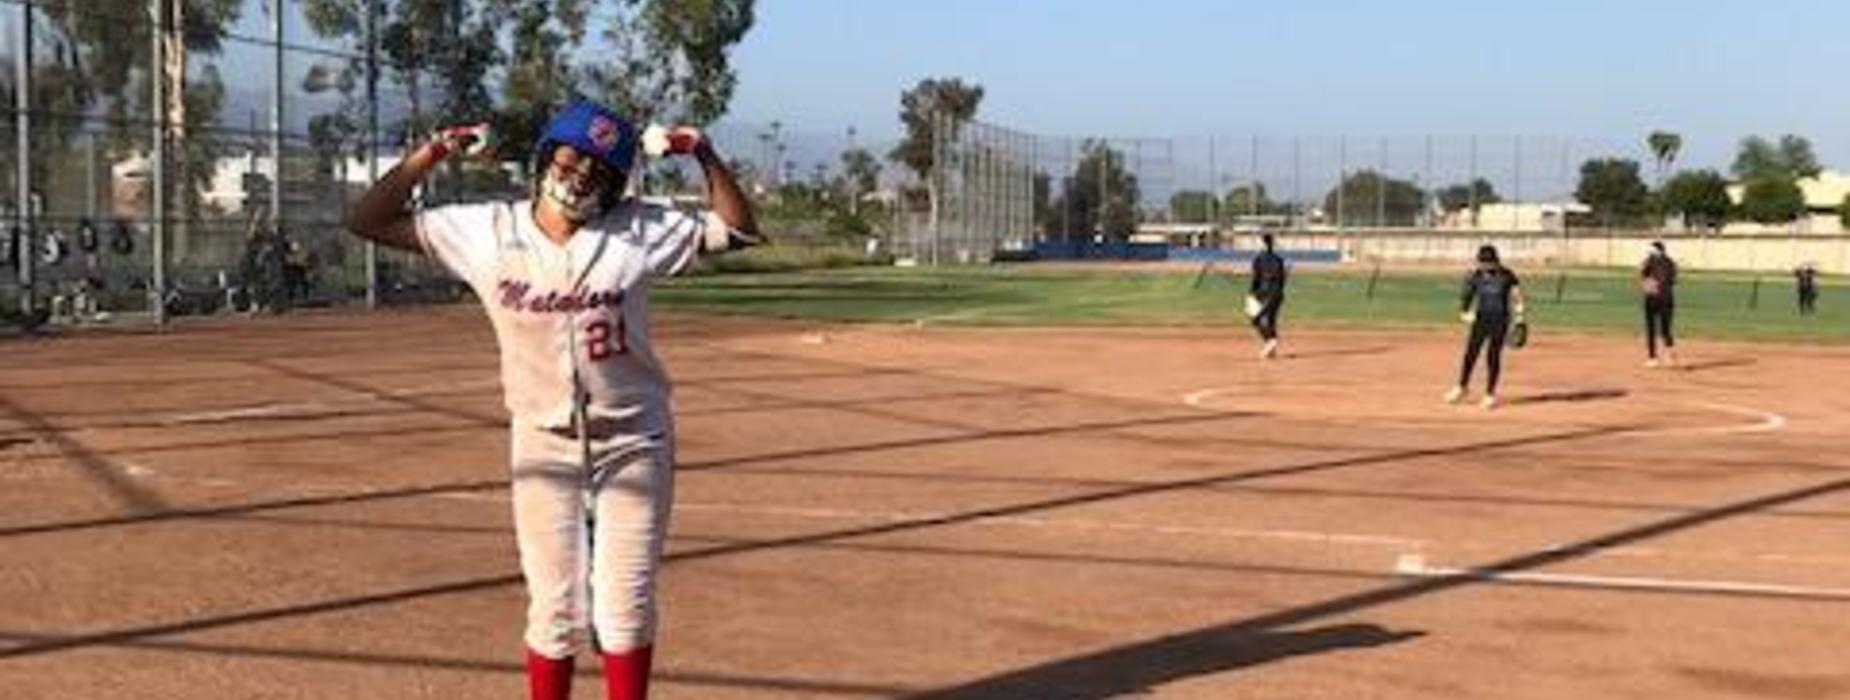 SGHS Matadors Baseball Game